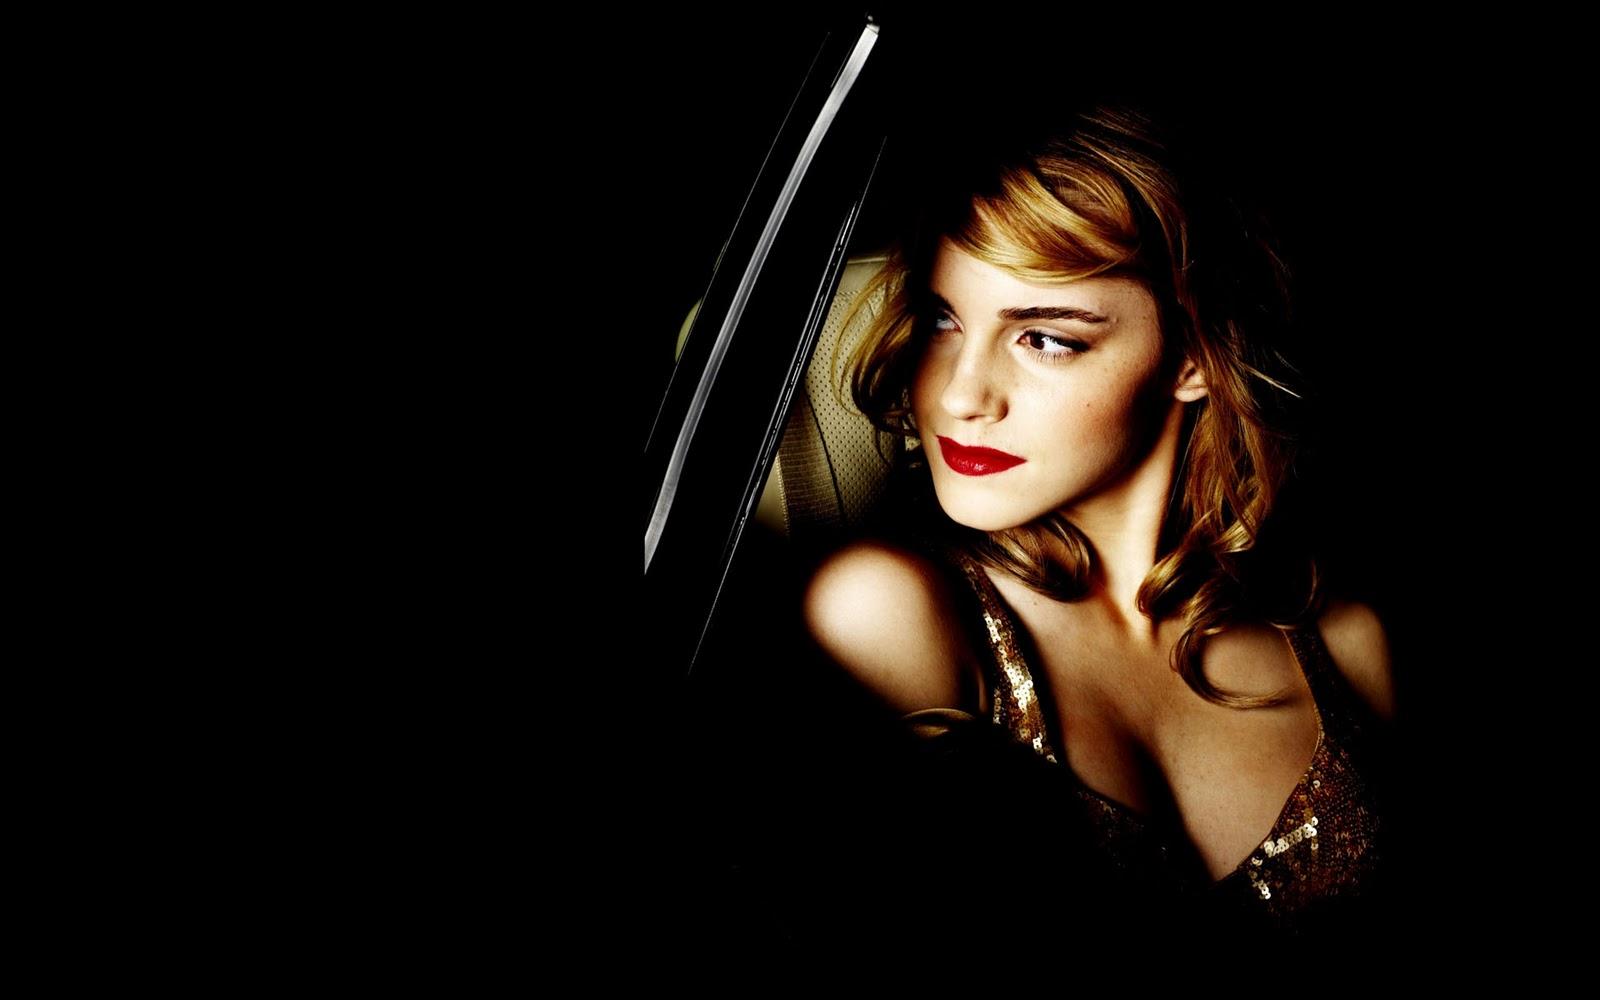 Desktop HD Wallpapers: Emma Watson Life Stories